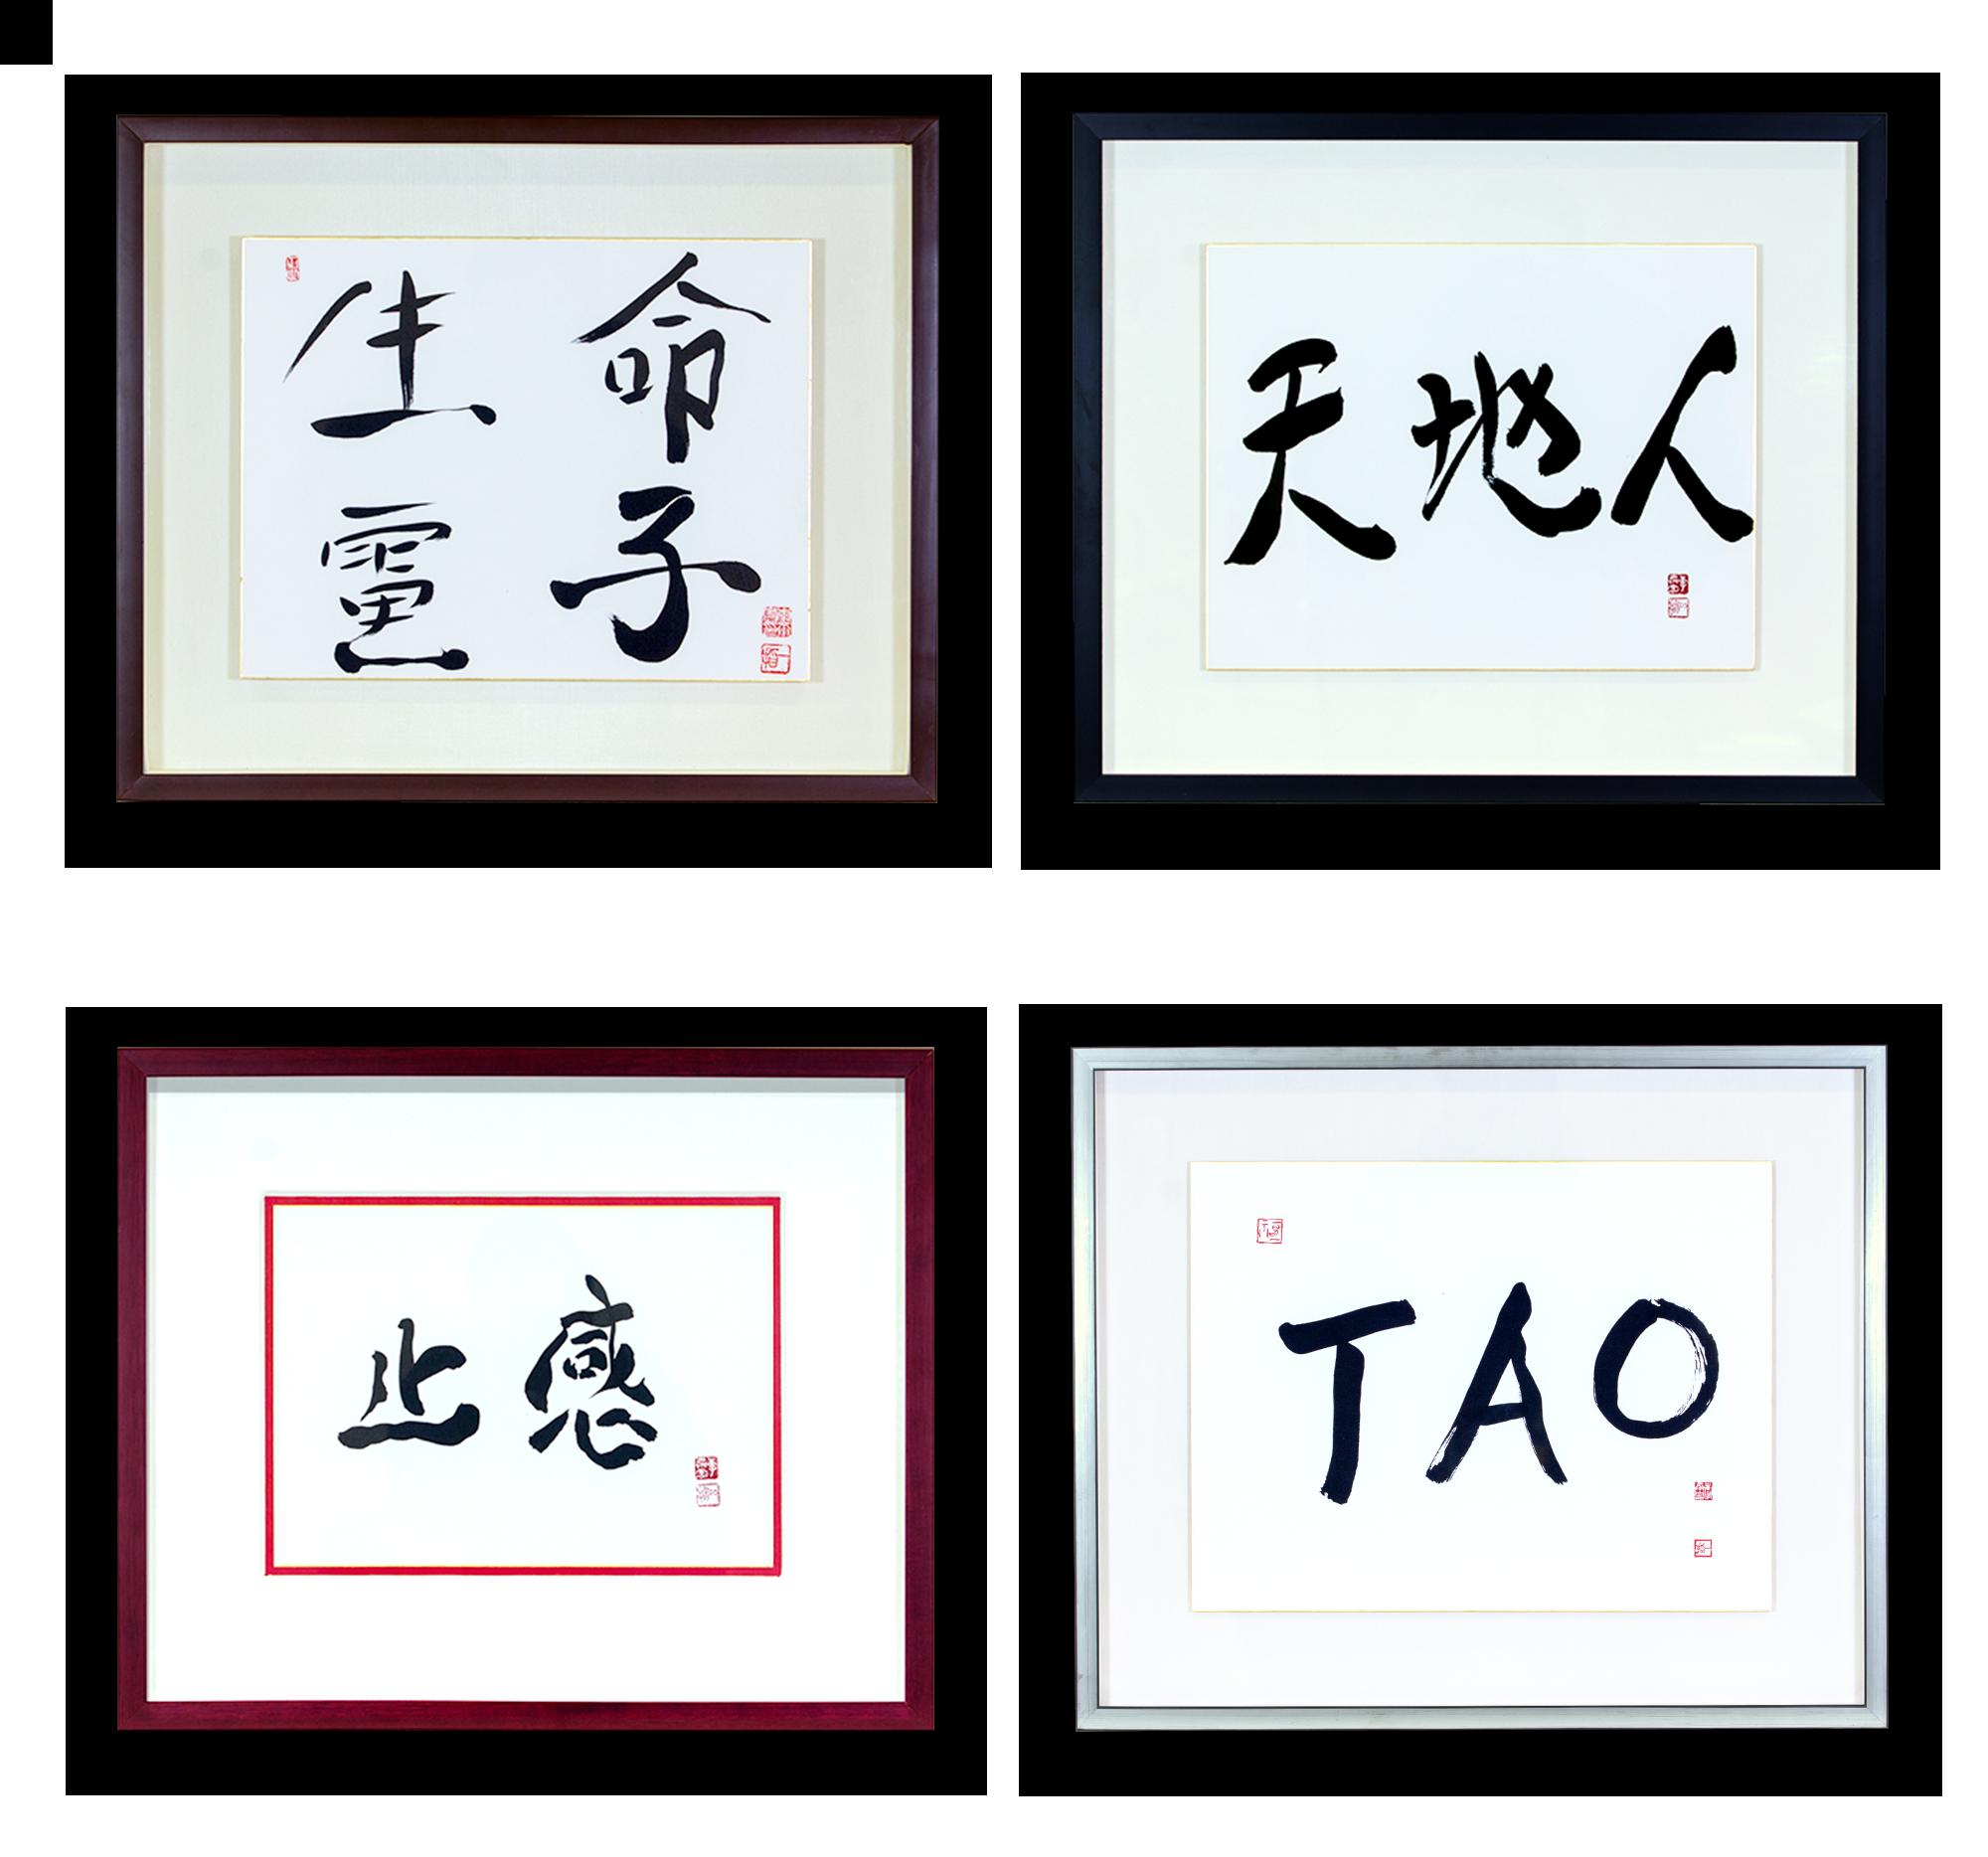 Ilchi Lee Calligraphy